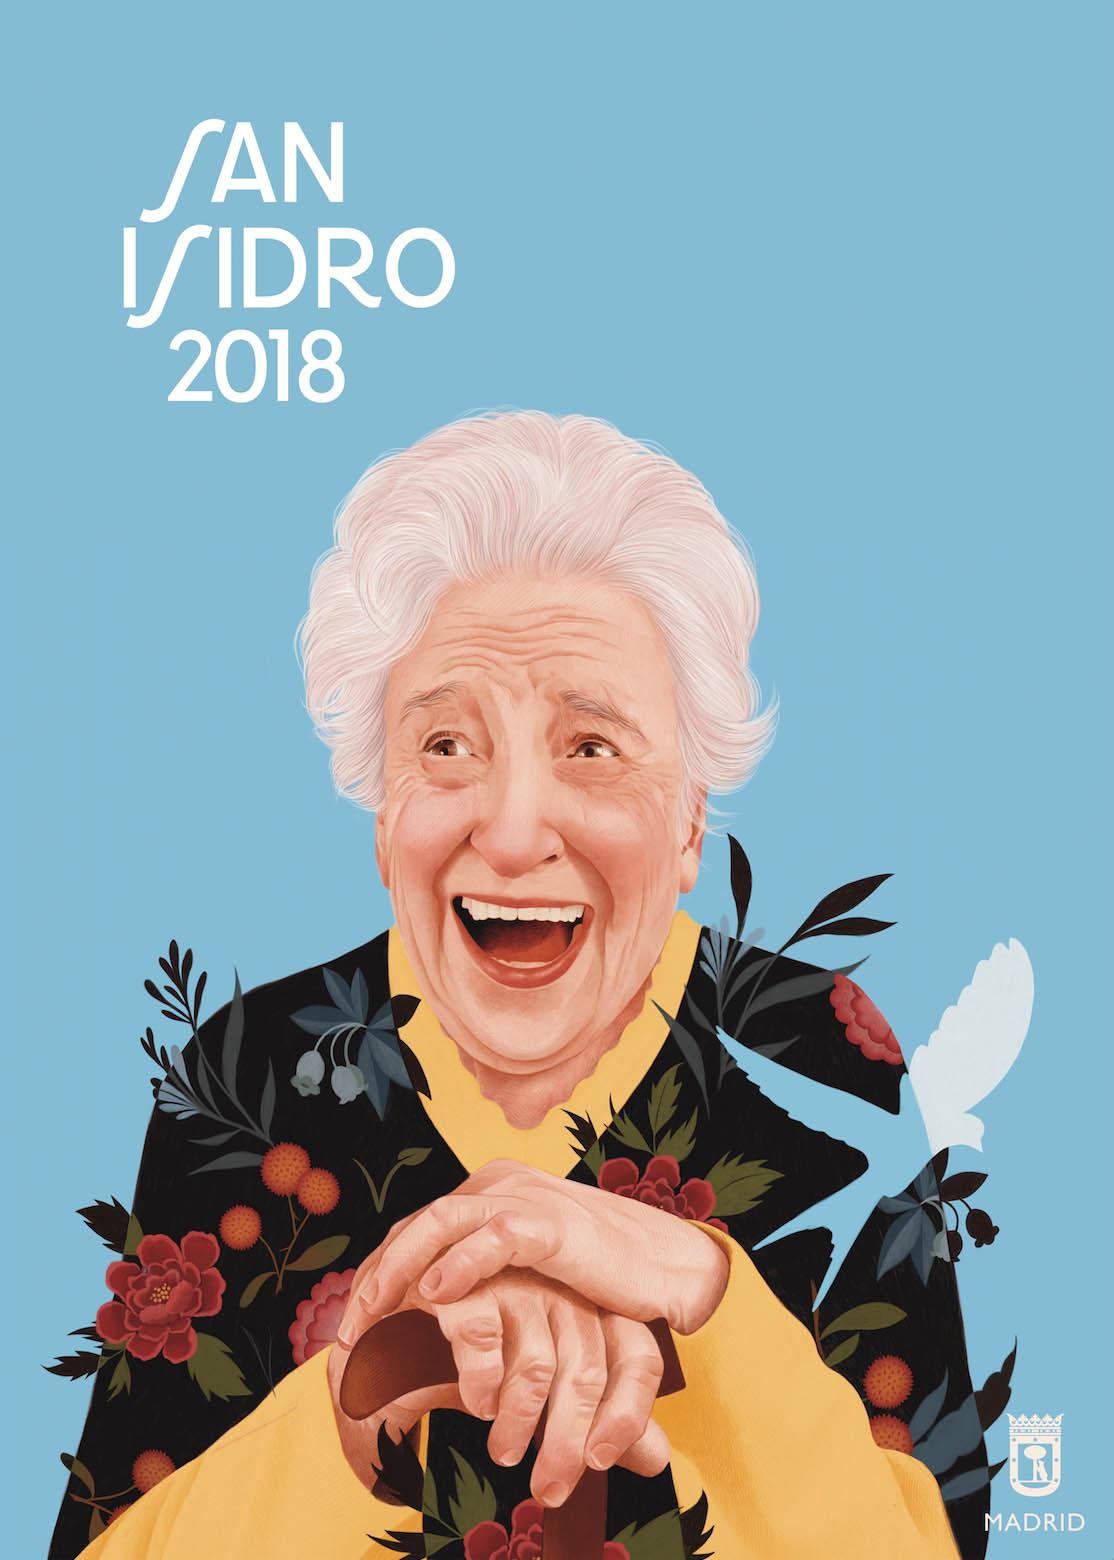 digital illustration woman portrait by mercedes debellard